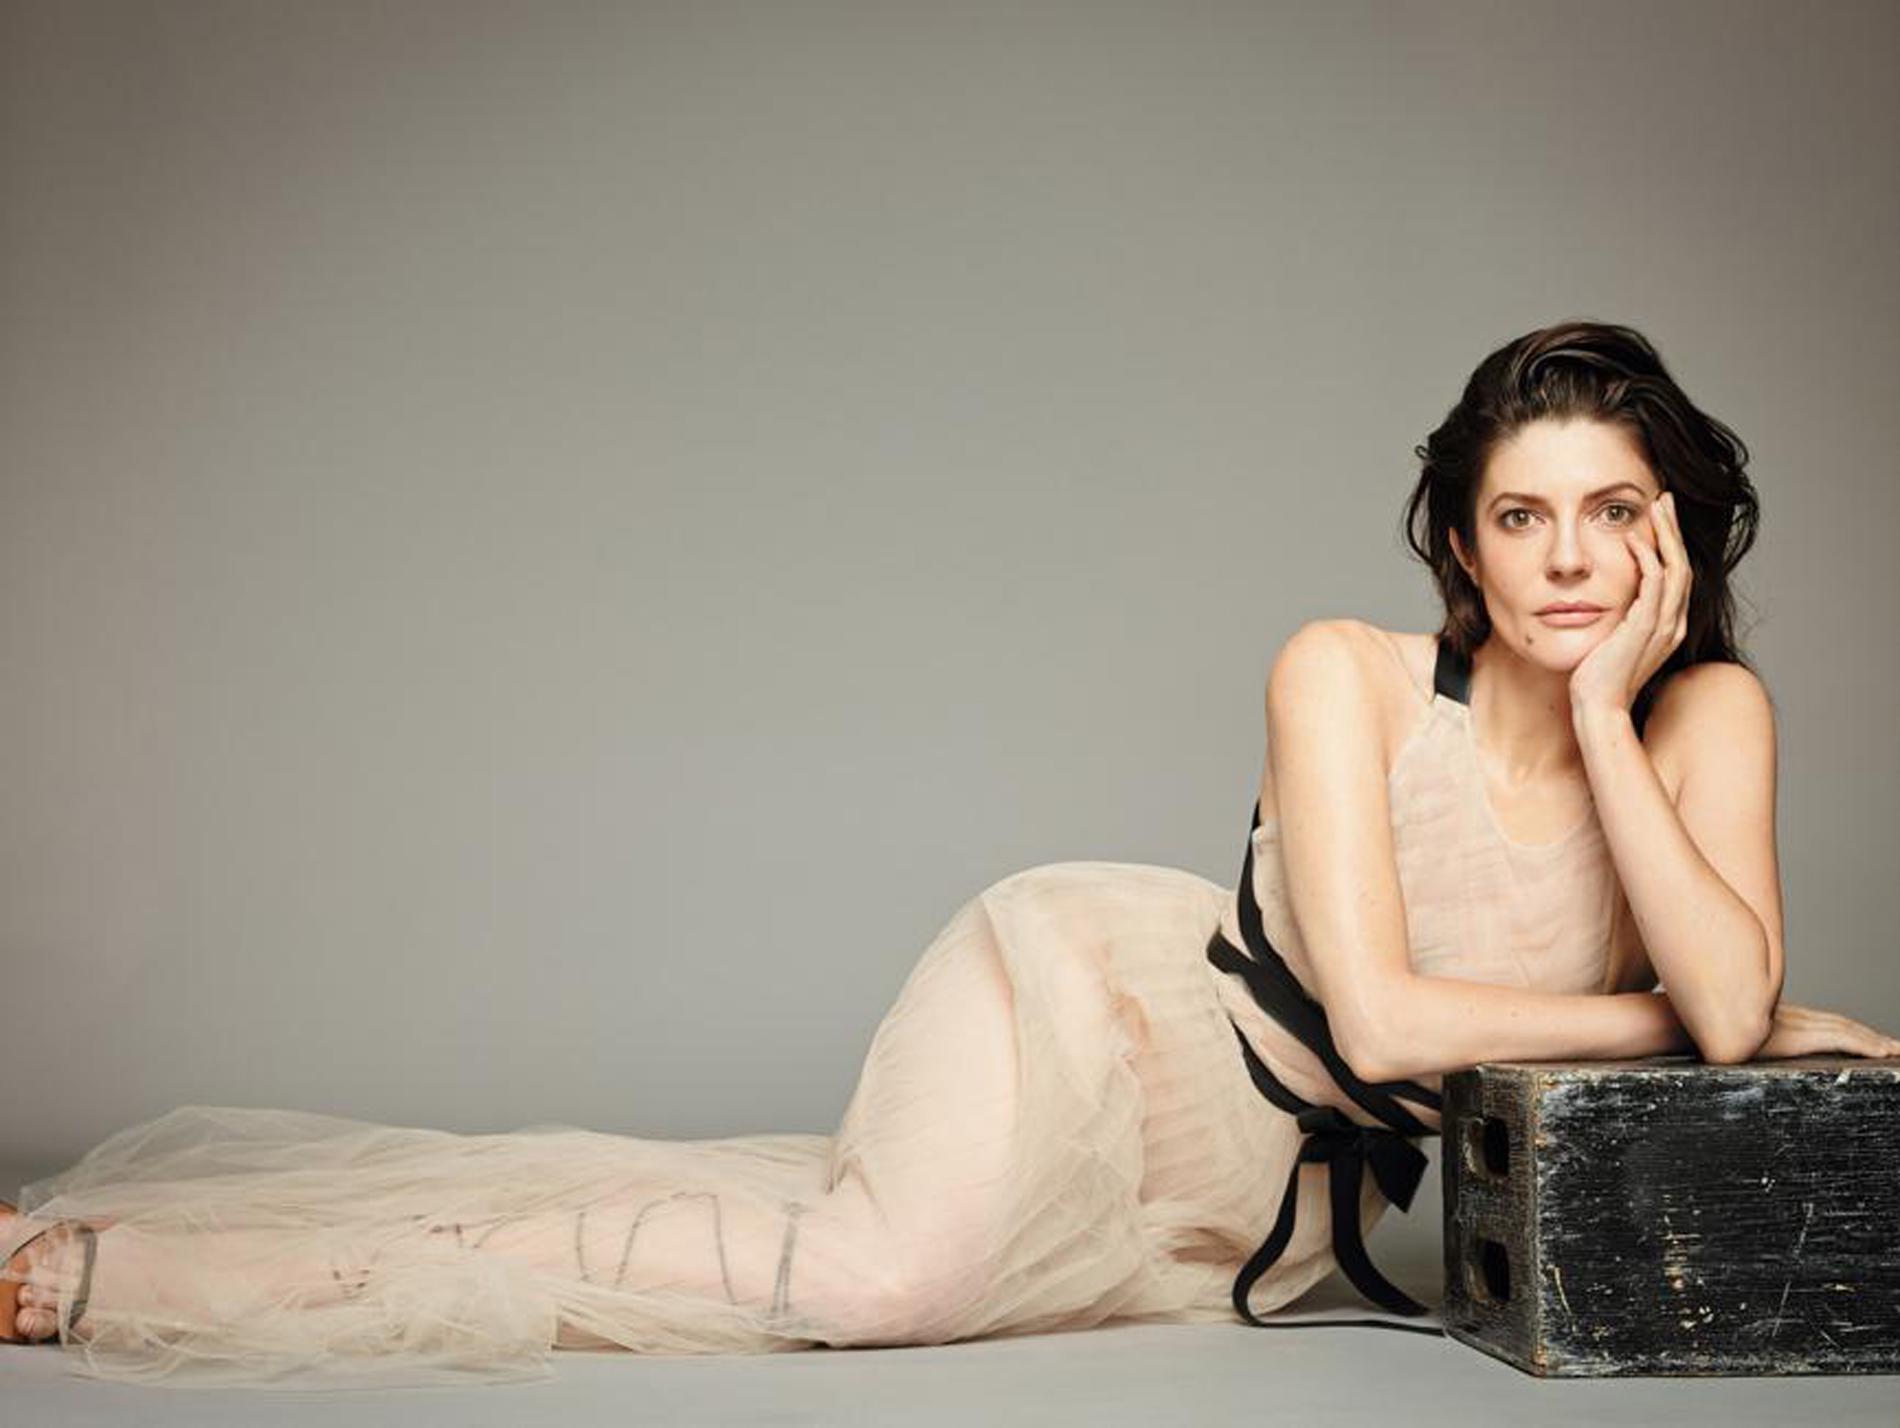 Chiara Mastroianni en robe transparente